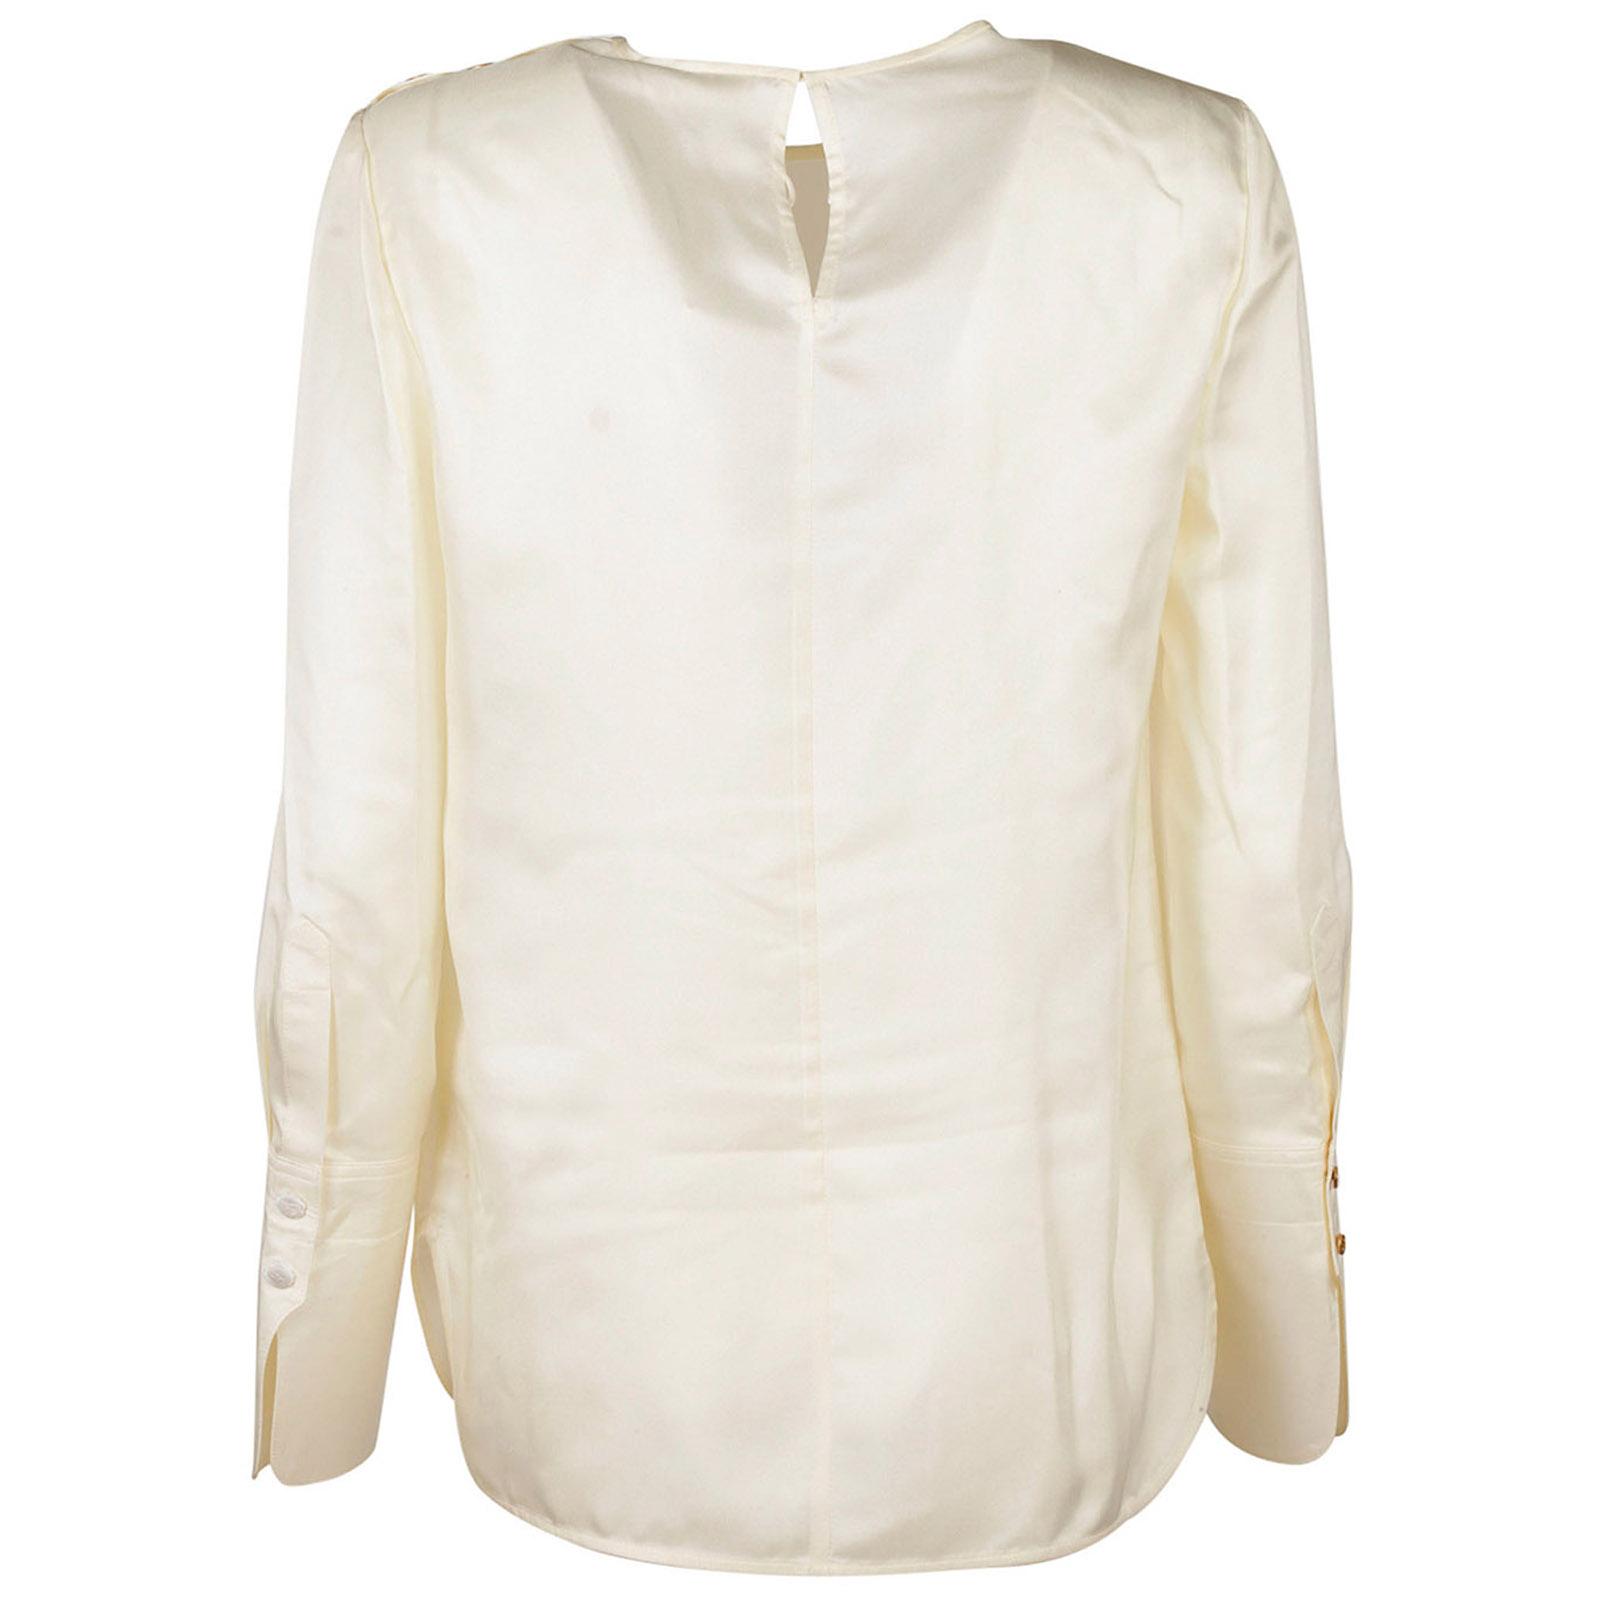 Camisa de mujer con mangas largas blusa